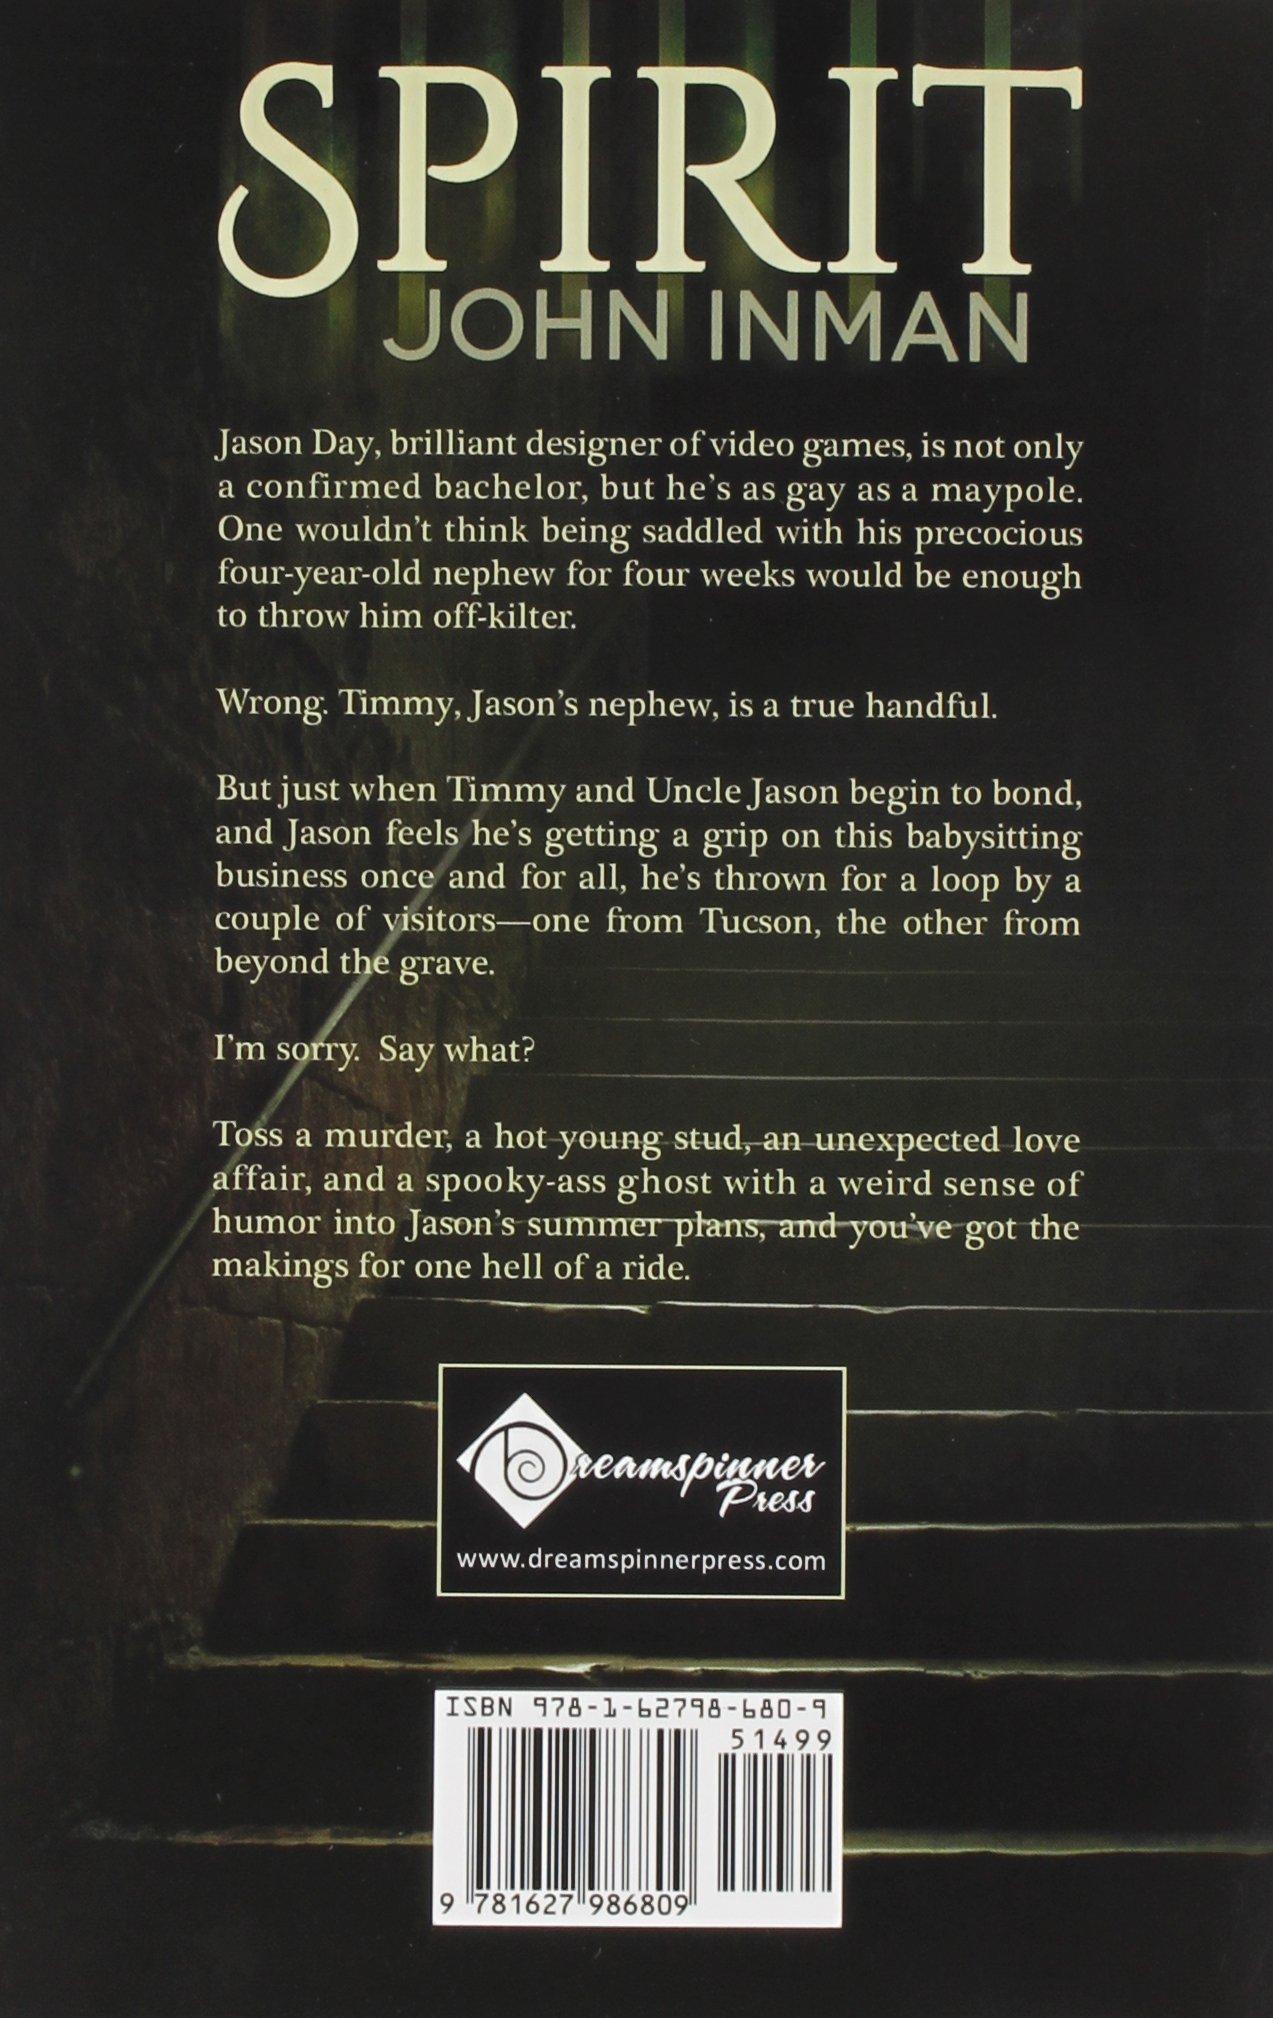 Spirit: John Inman: 9781627986809: Amazon.com: Books